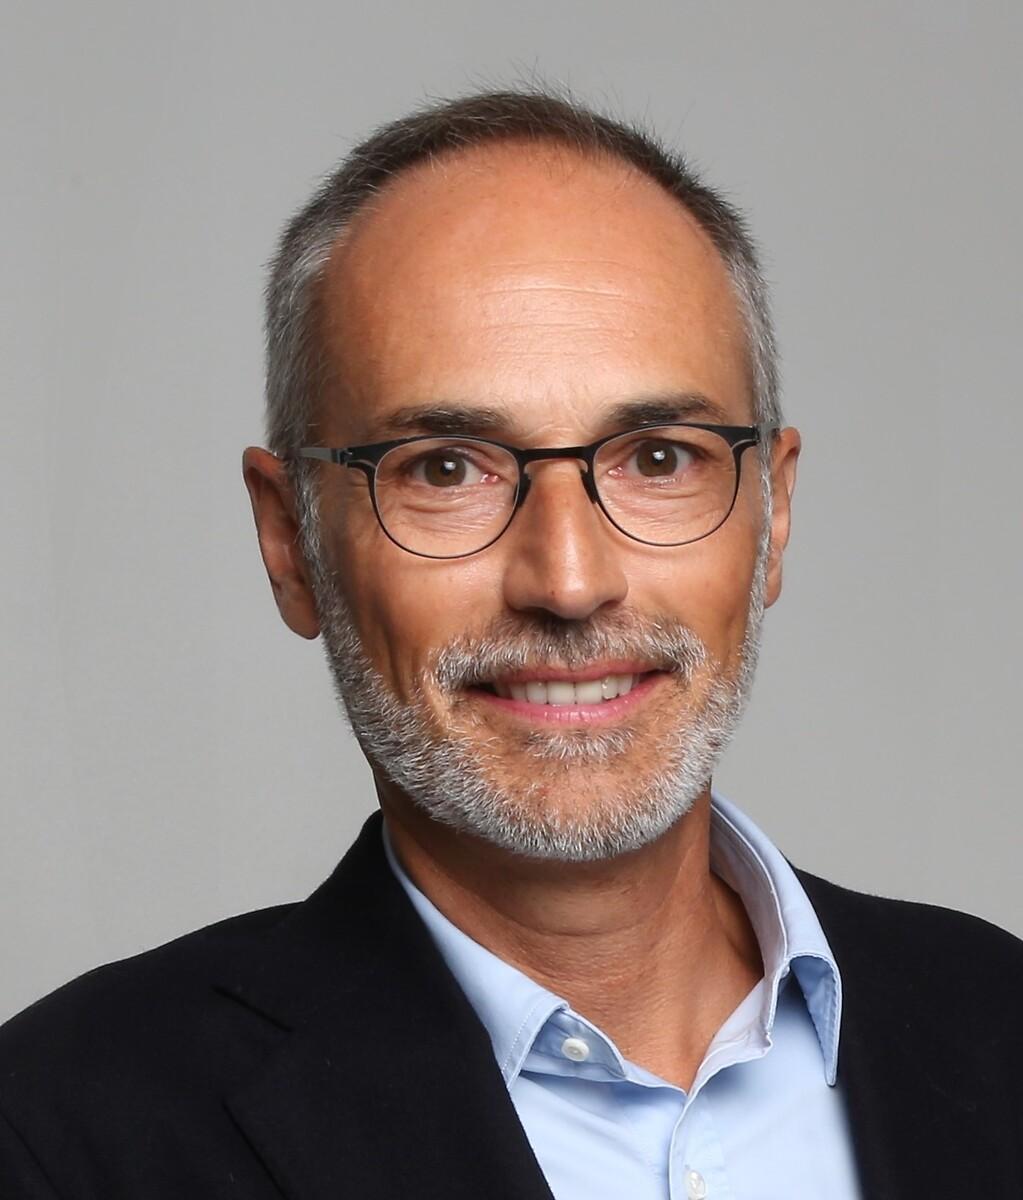 Pierre-Andre Masteau